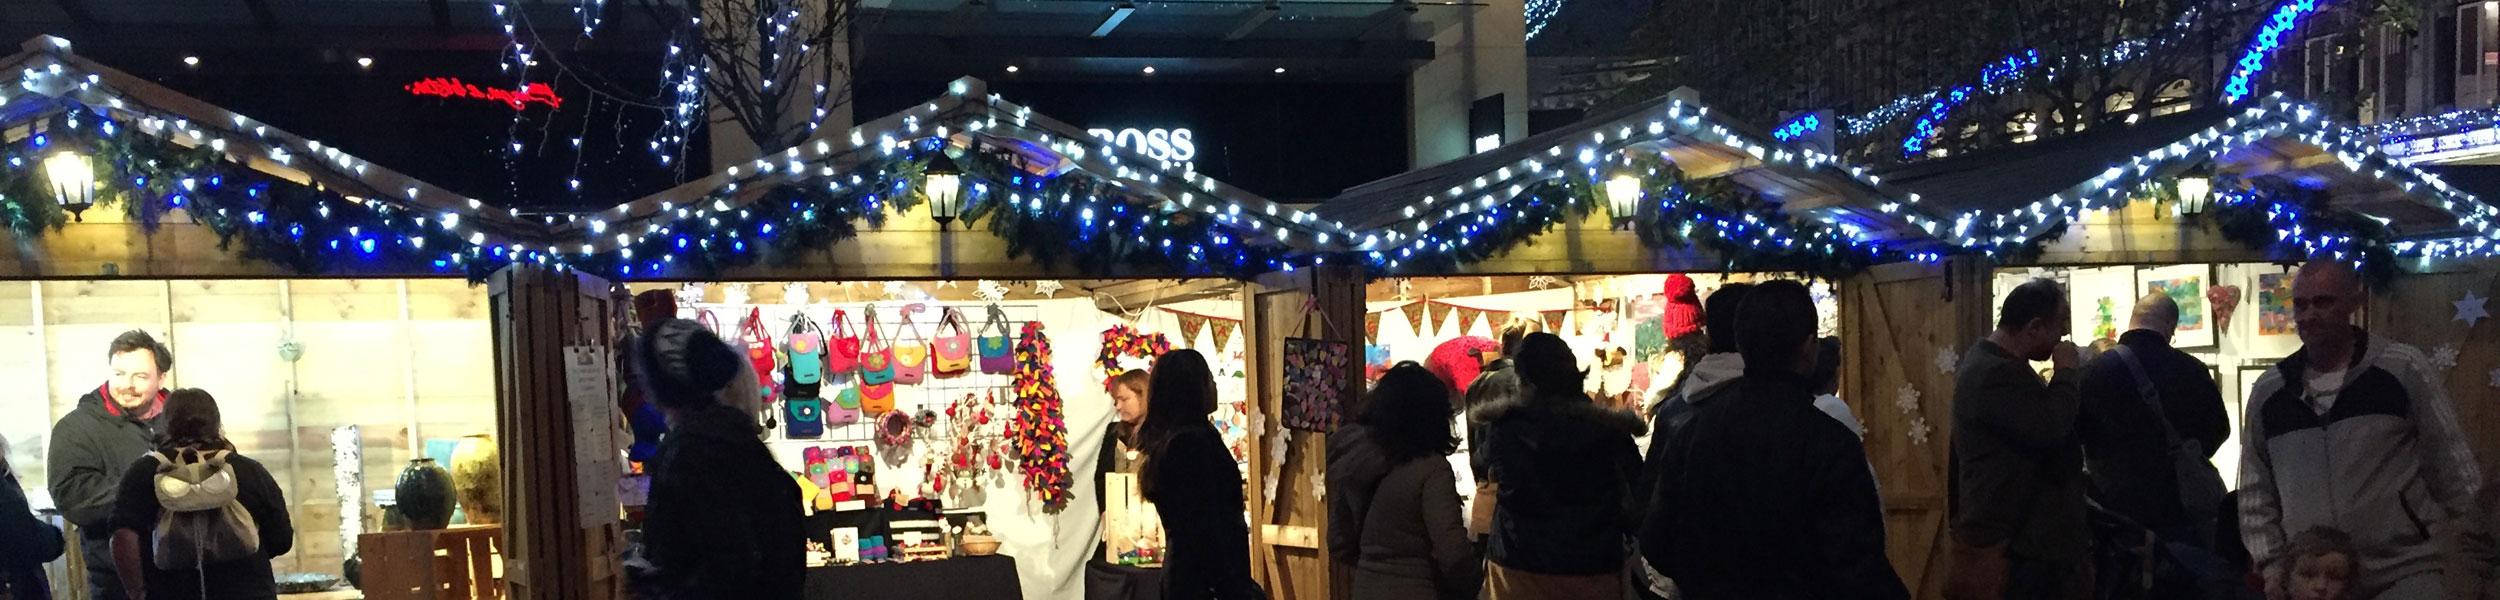 cardiff-christmas-market-04